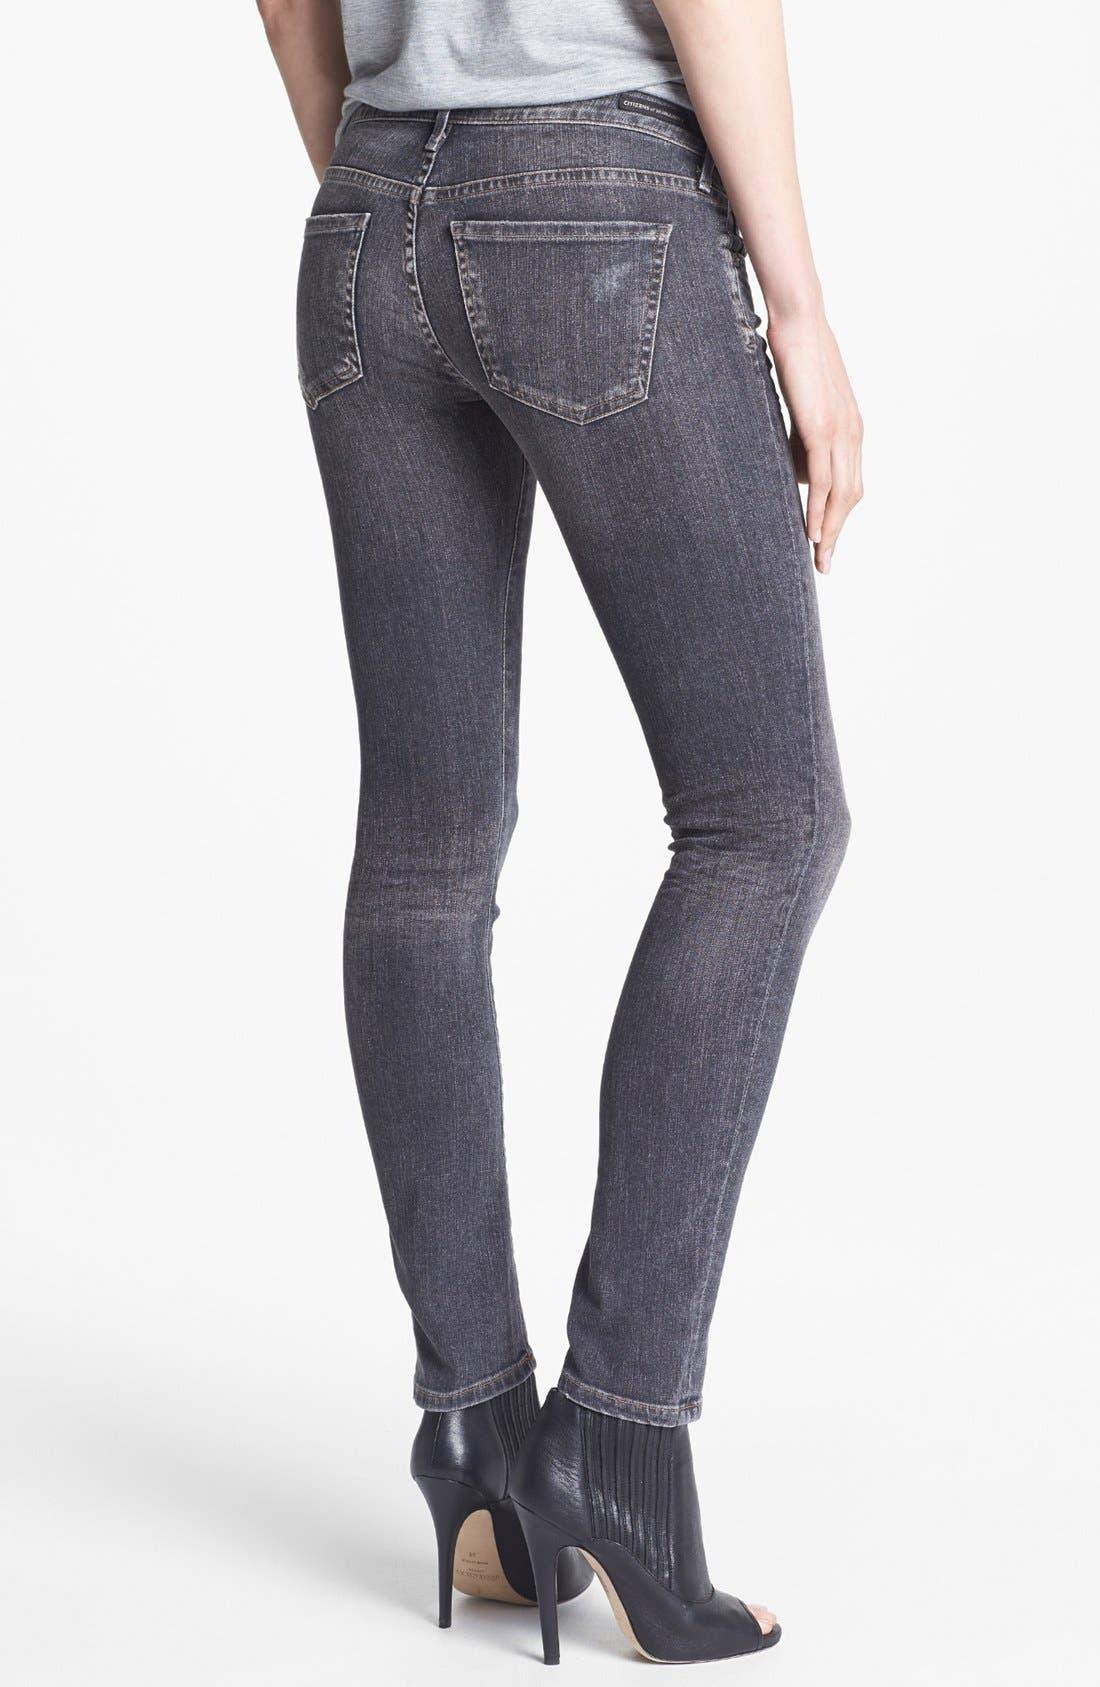 'Racer' Low Rise Skinny Jeans,                             Alternate thumbnail 2, color,                             Black Slash